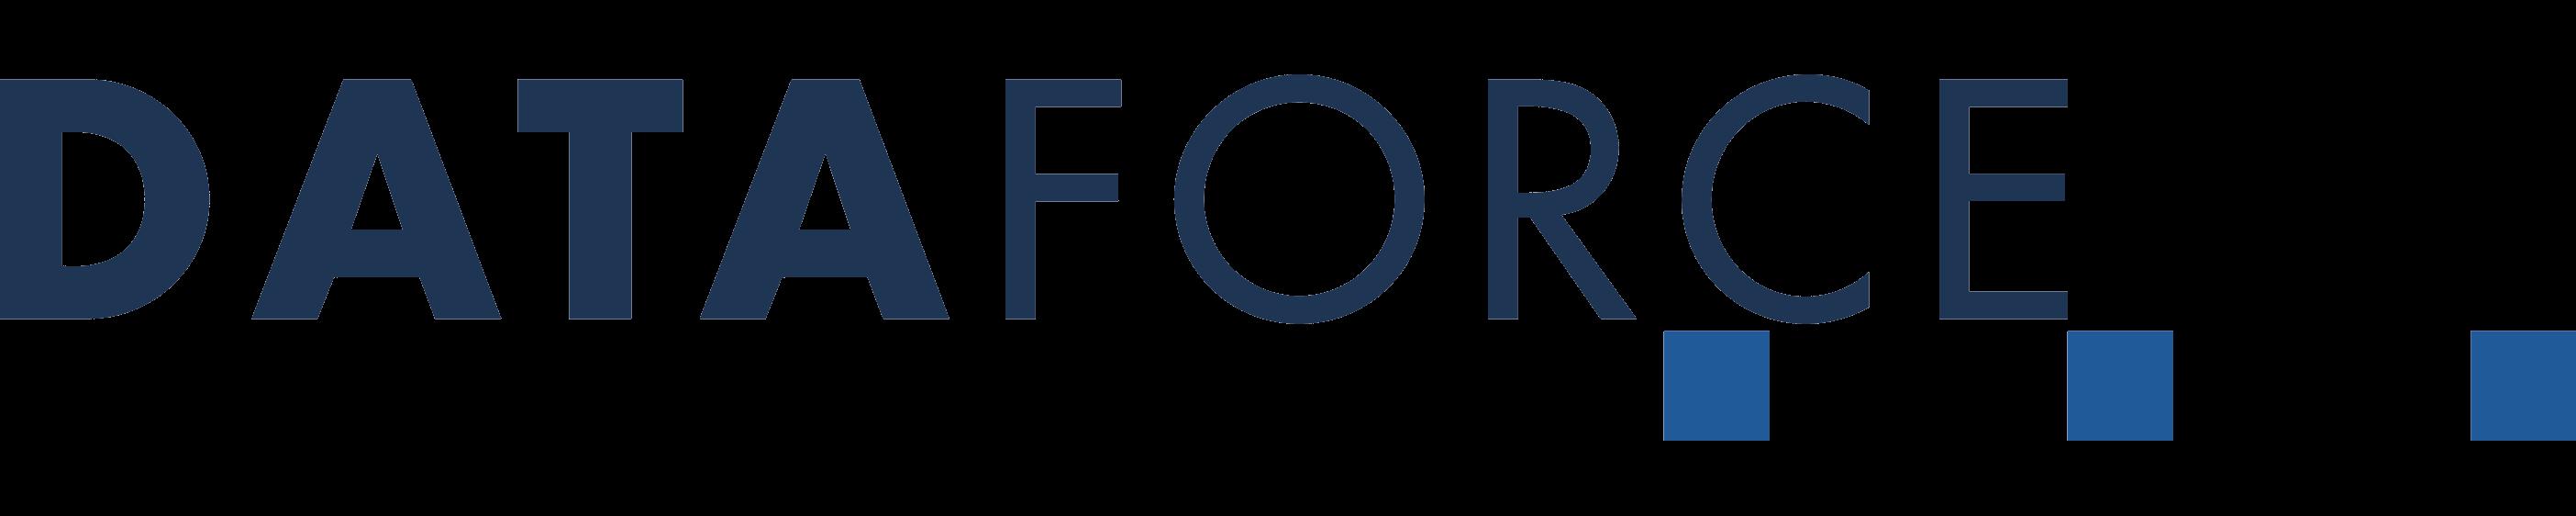 cropped-cropped-dataforce-original-logo-farbig11.png